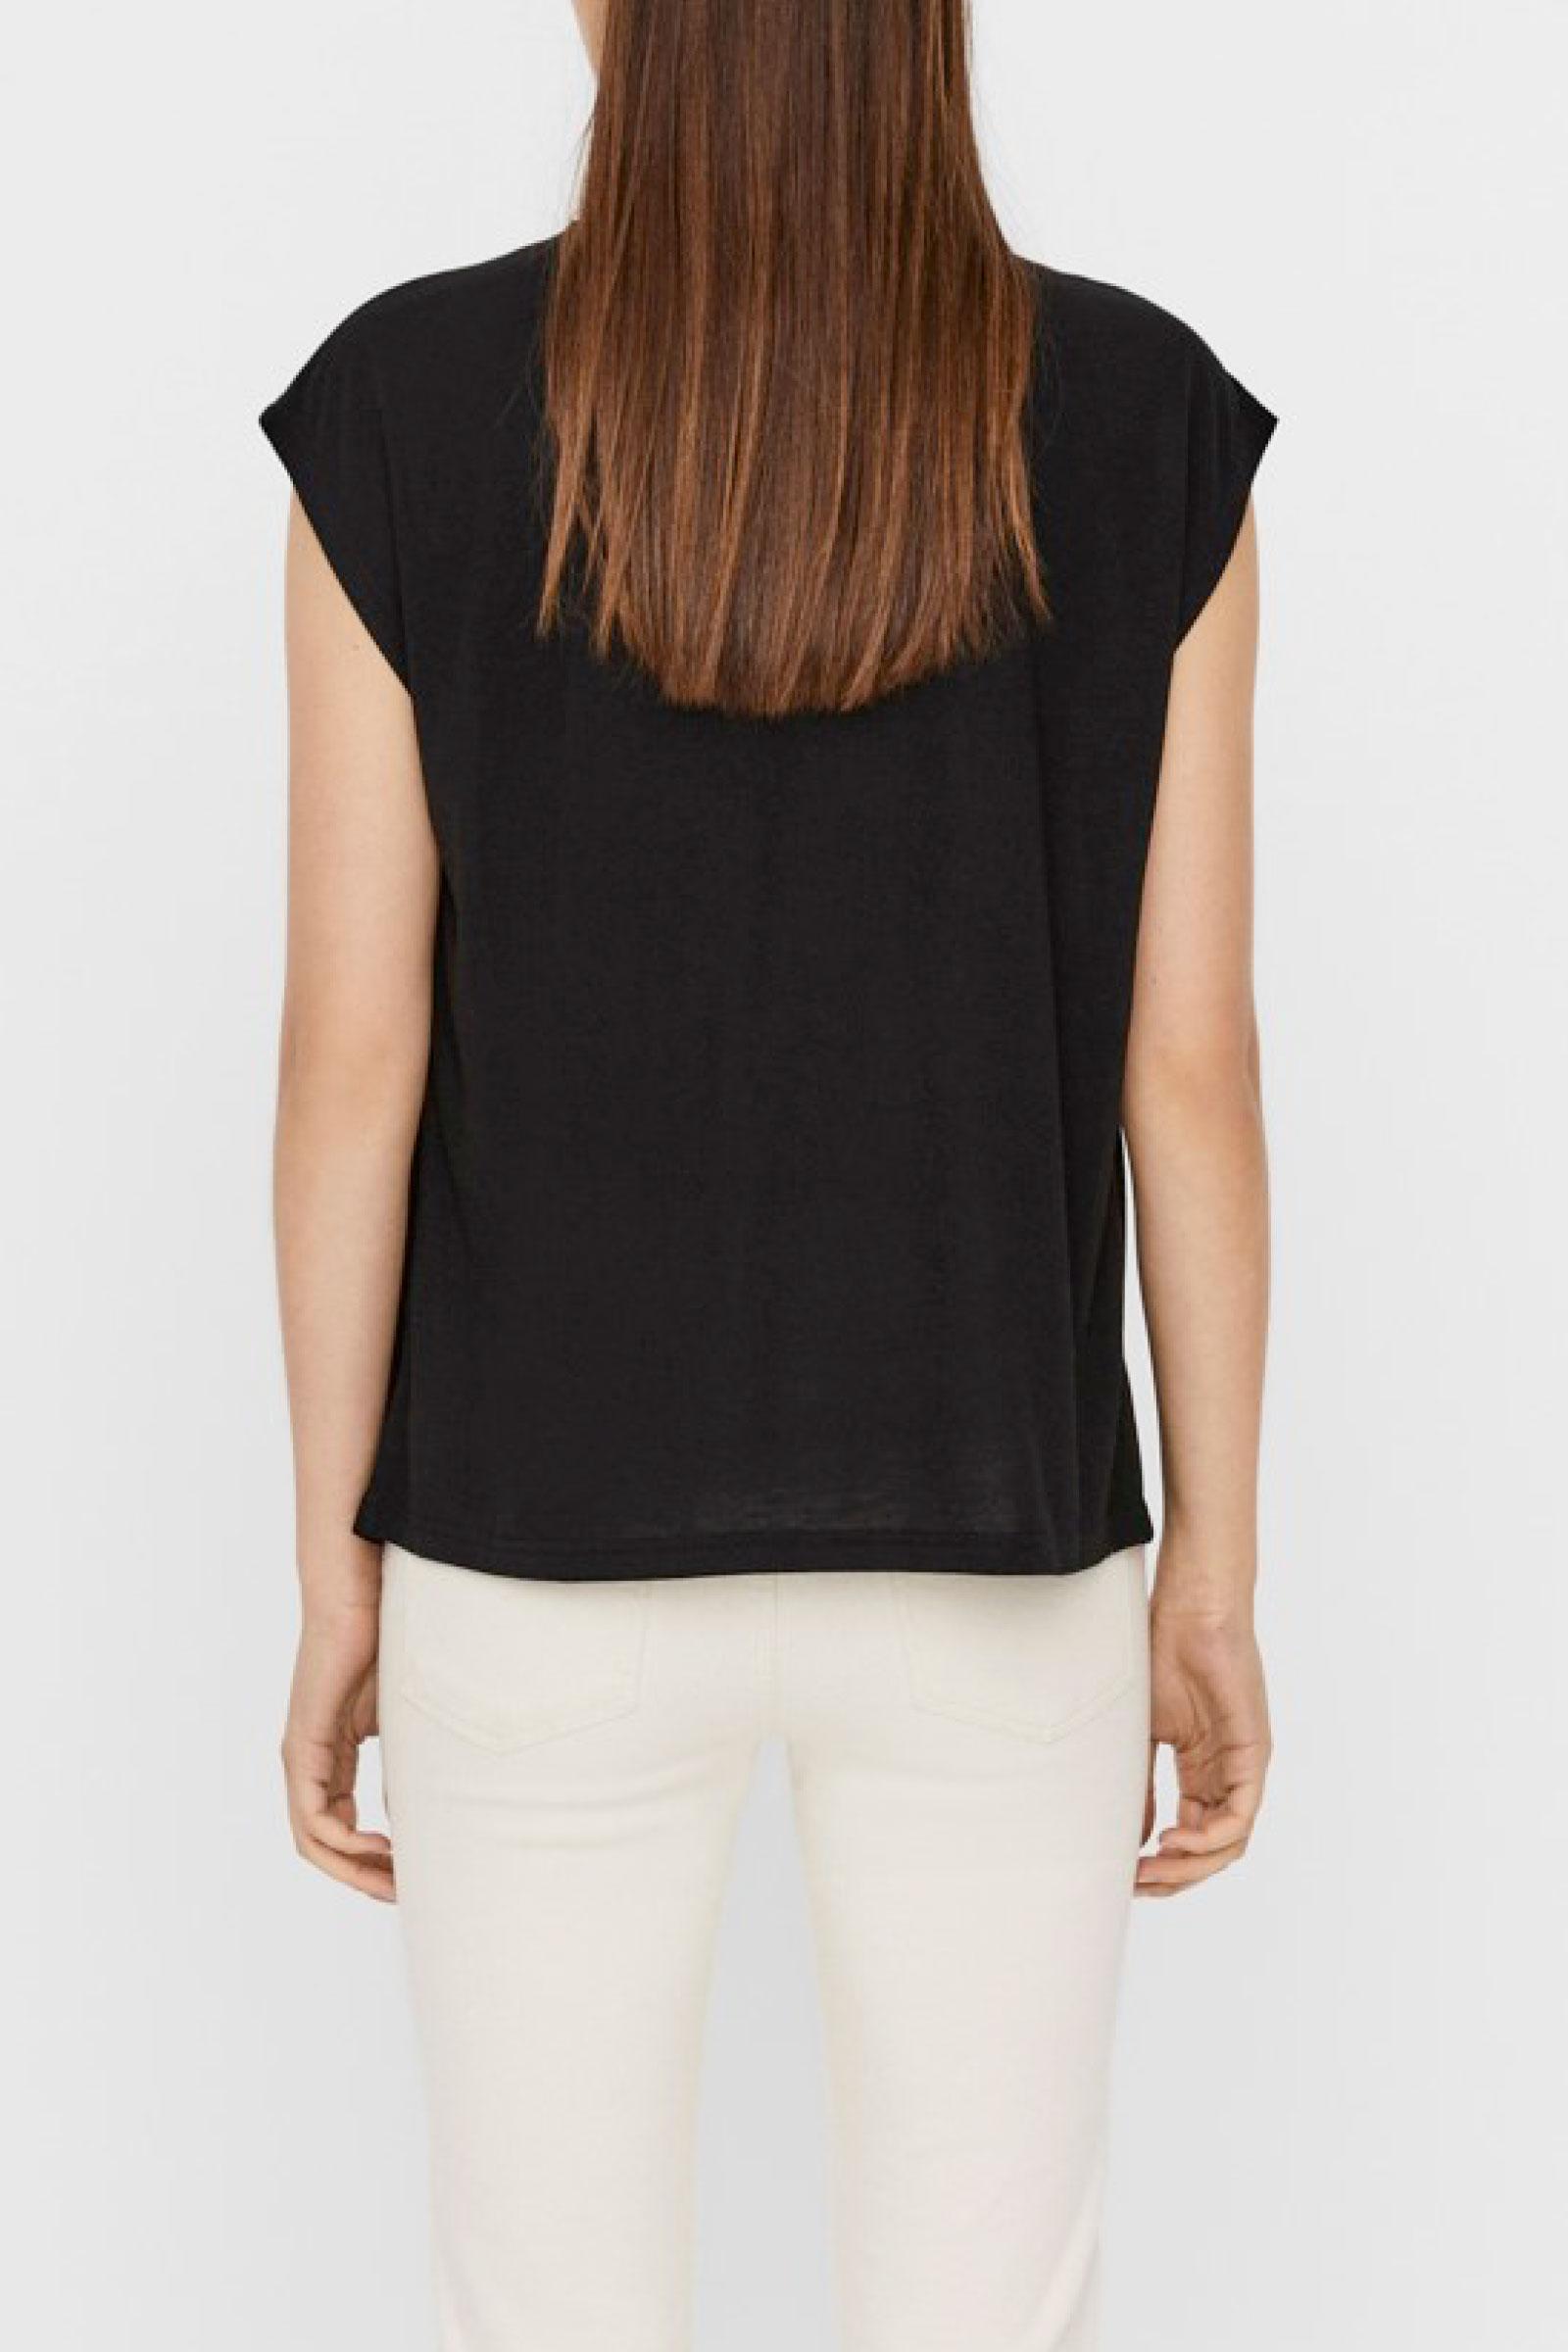 VERO MODA T-SHIRT Donna Modello CARRIE VERO MODA | T-Shirt | 10244100Black